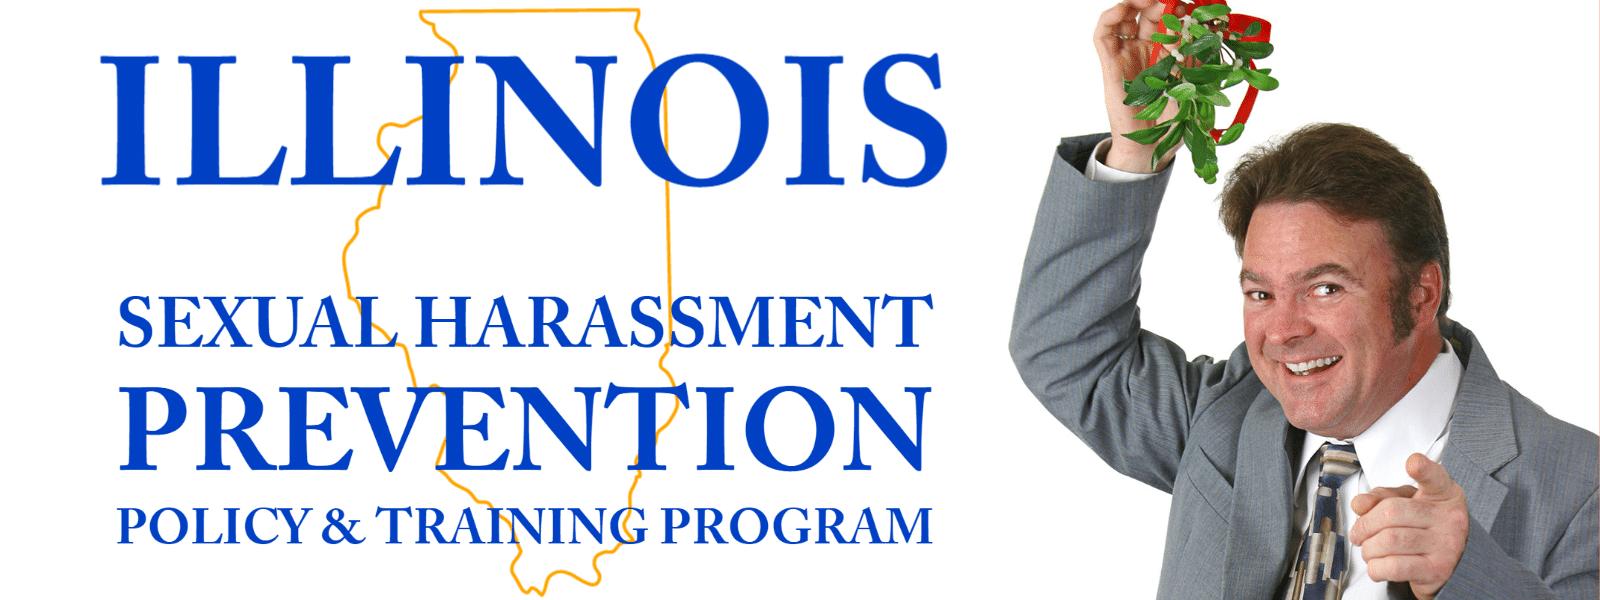 Illinois Sexual Harassment Prevention Program